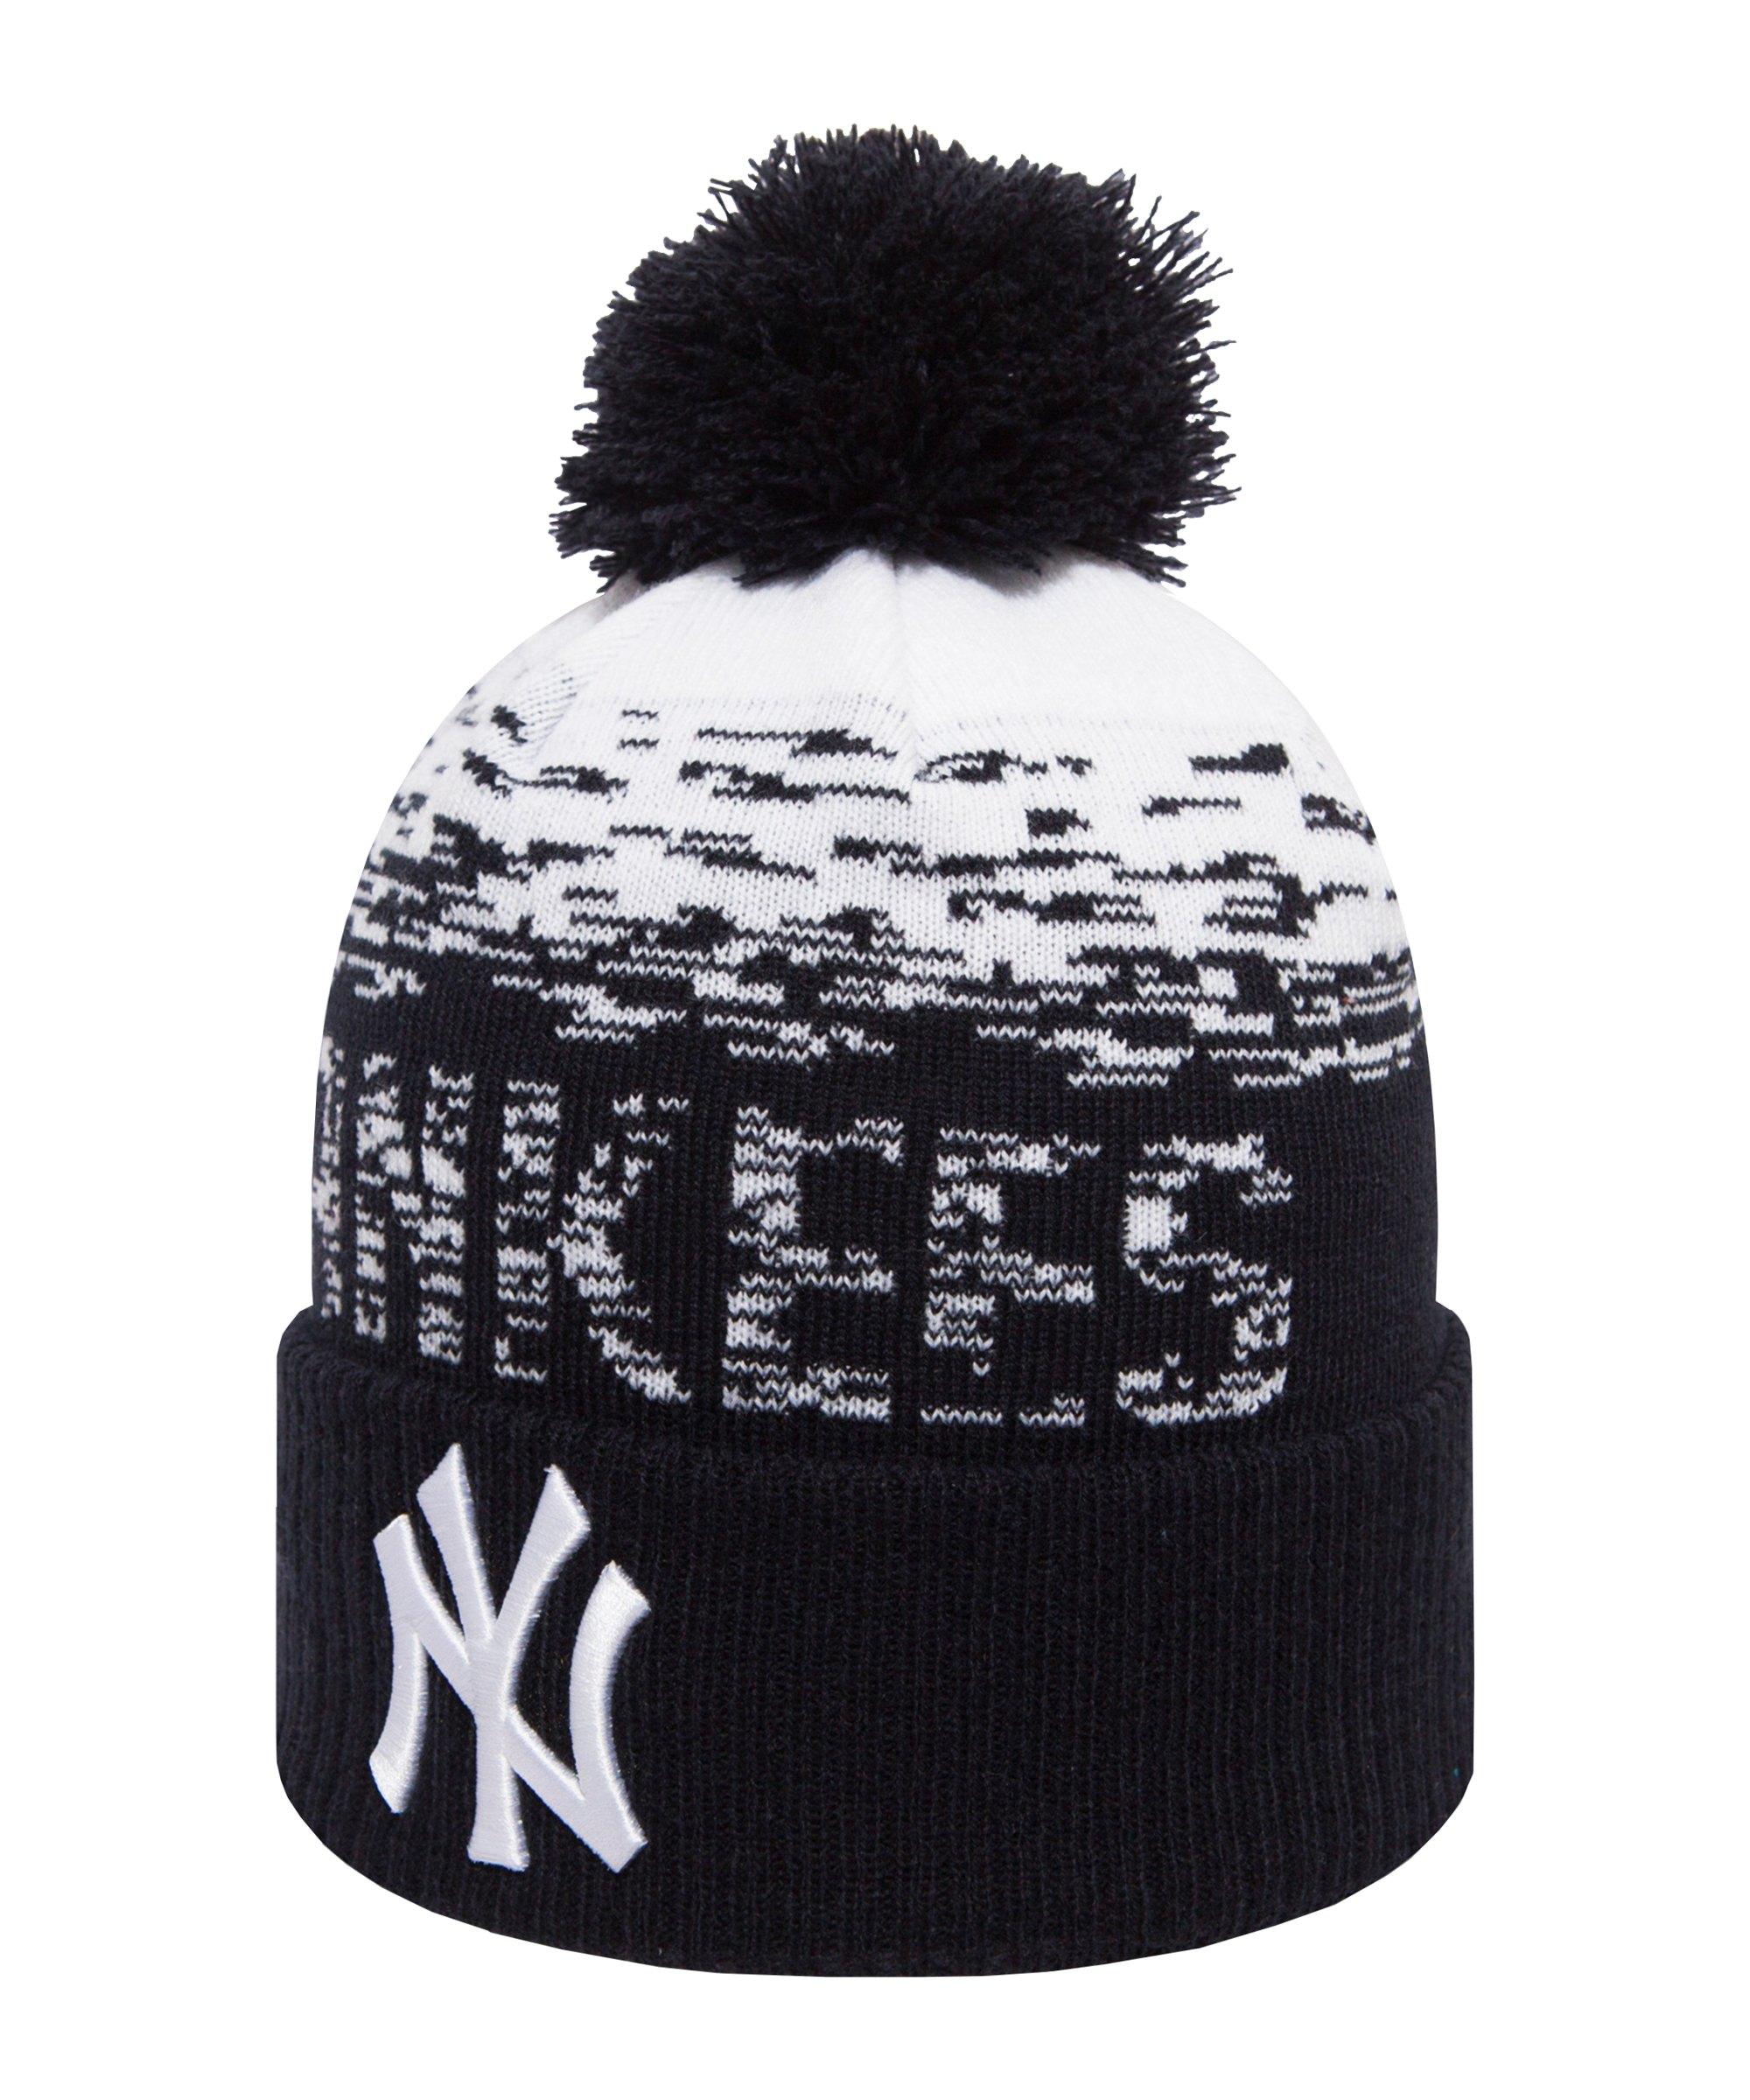 New Era NY Yankees Beanie Bommel Schwarz FOTC - schwarz